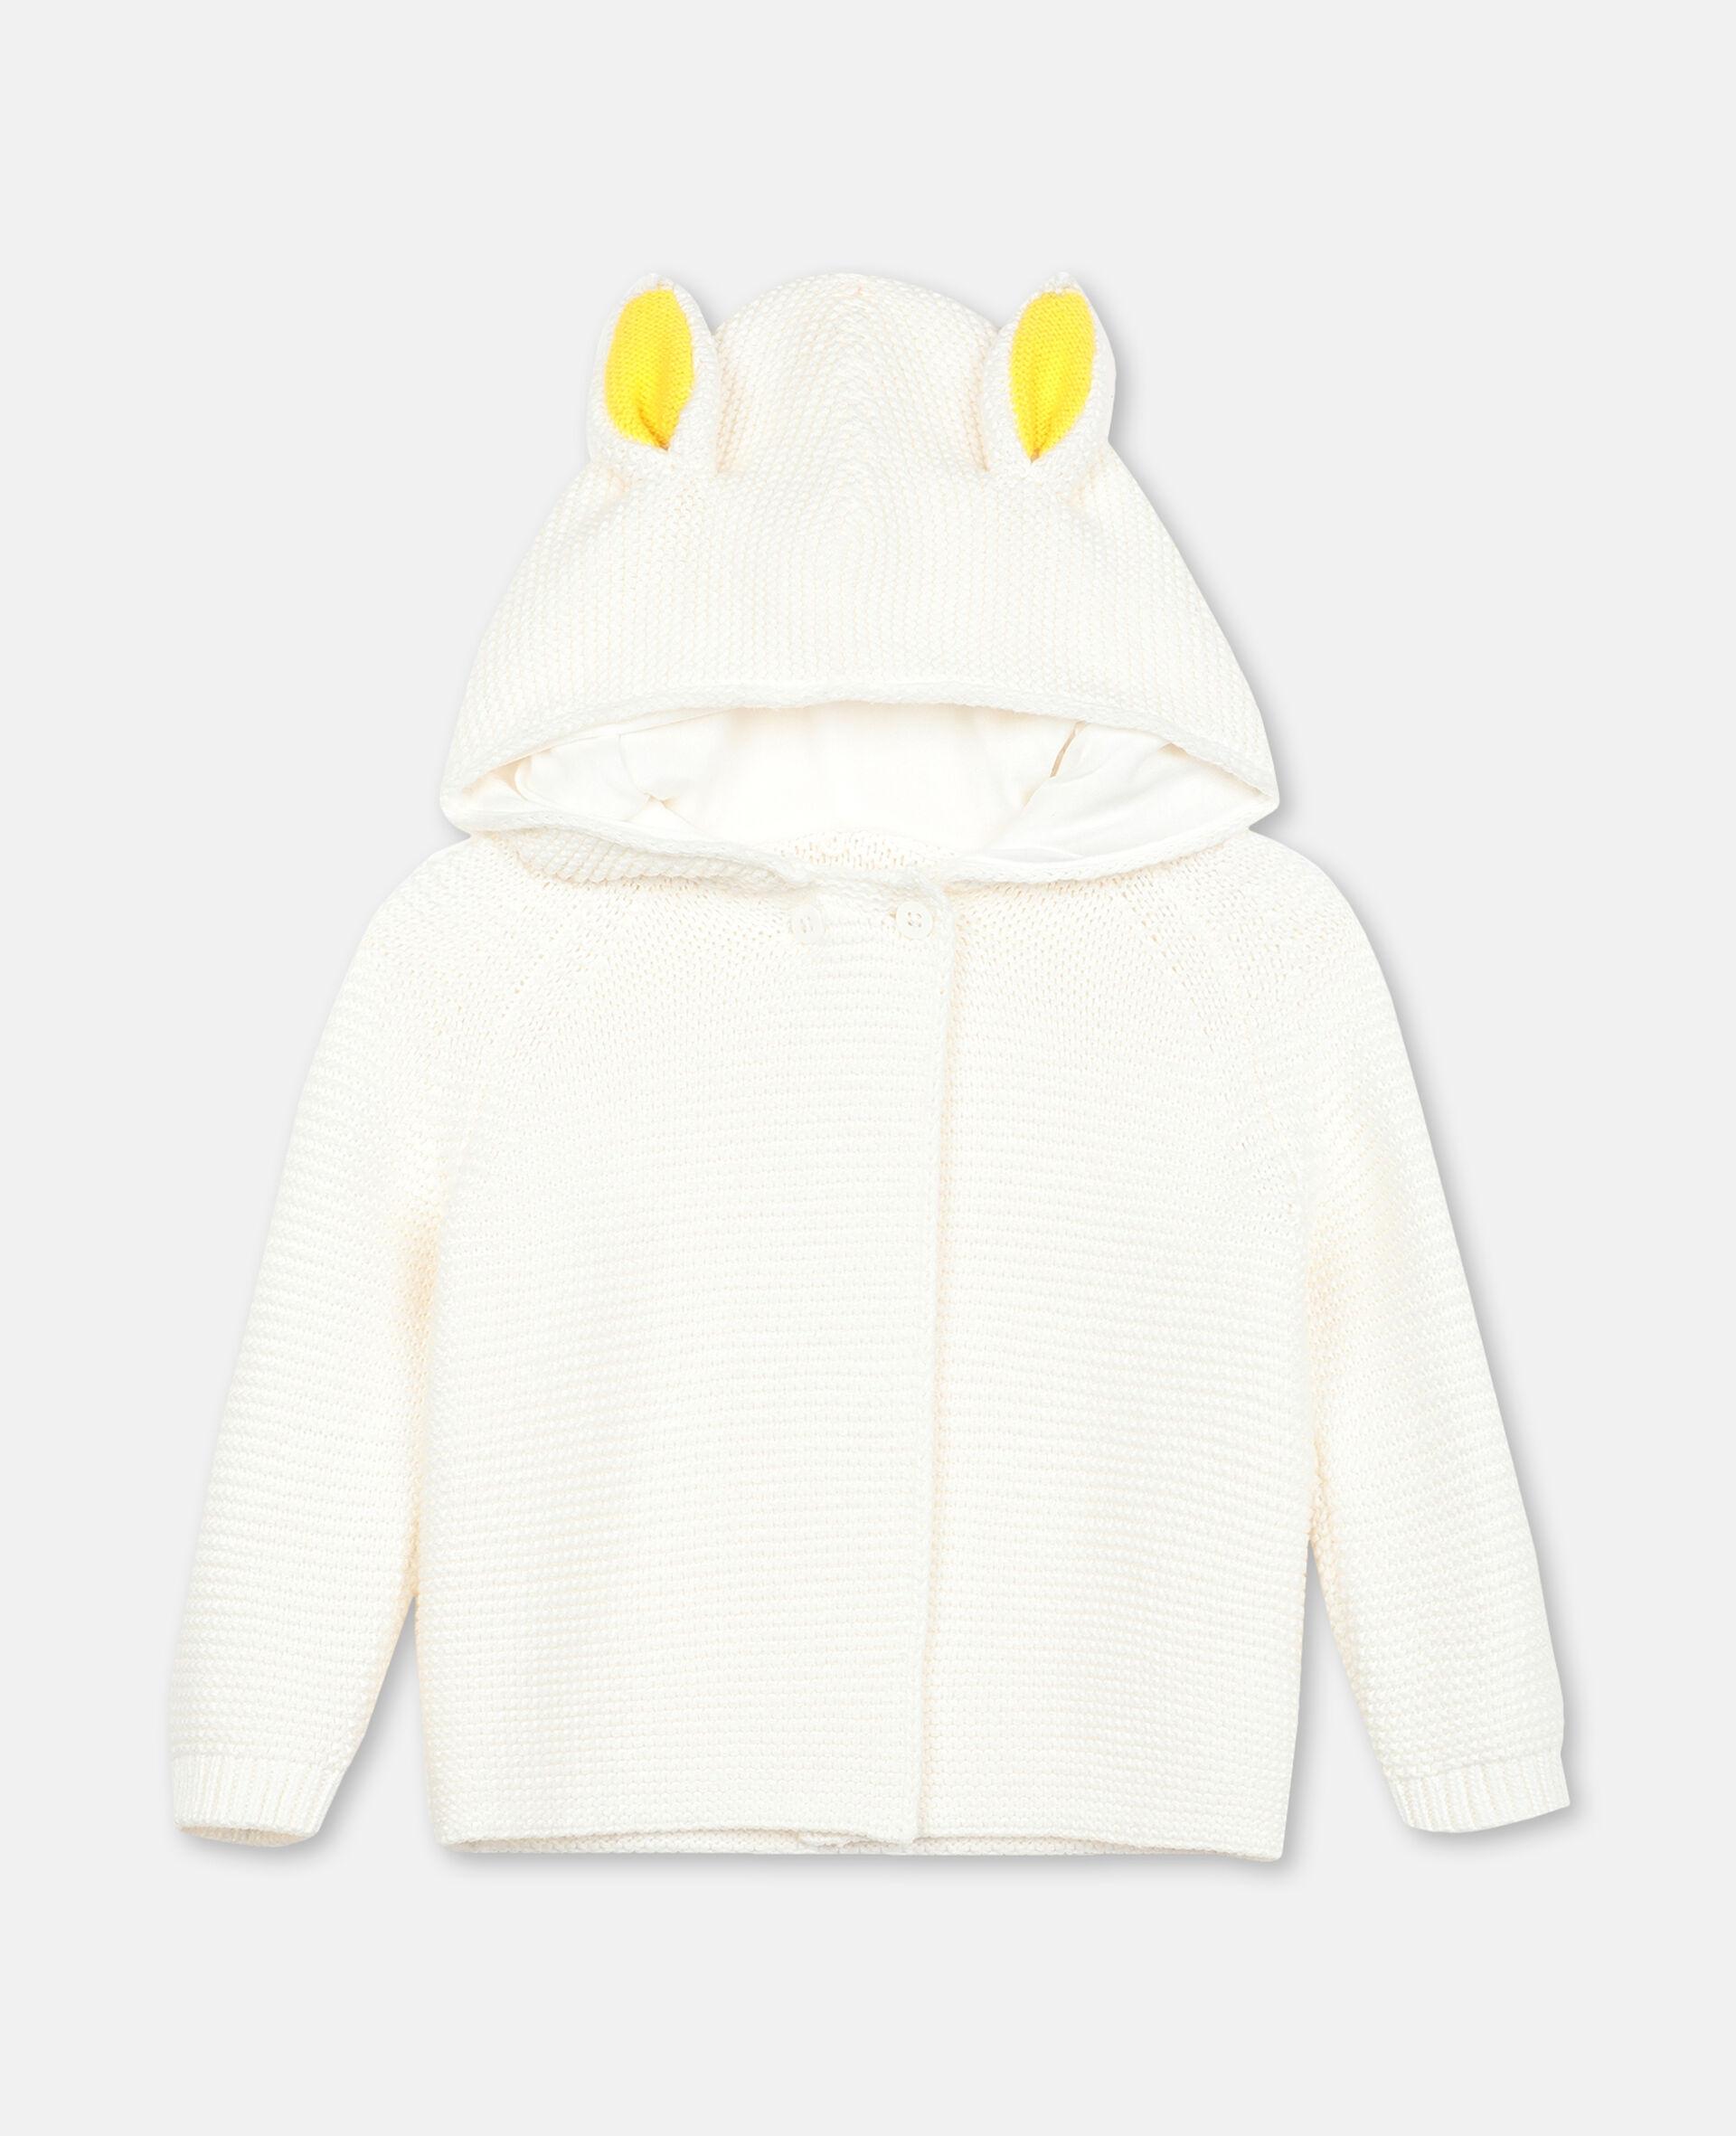 Bunny Knit Cardigan-White-large image number 0